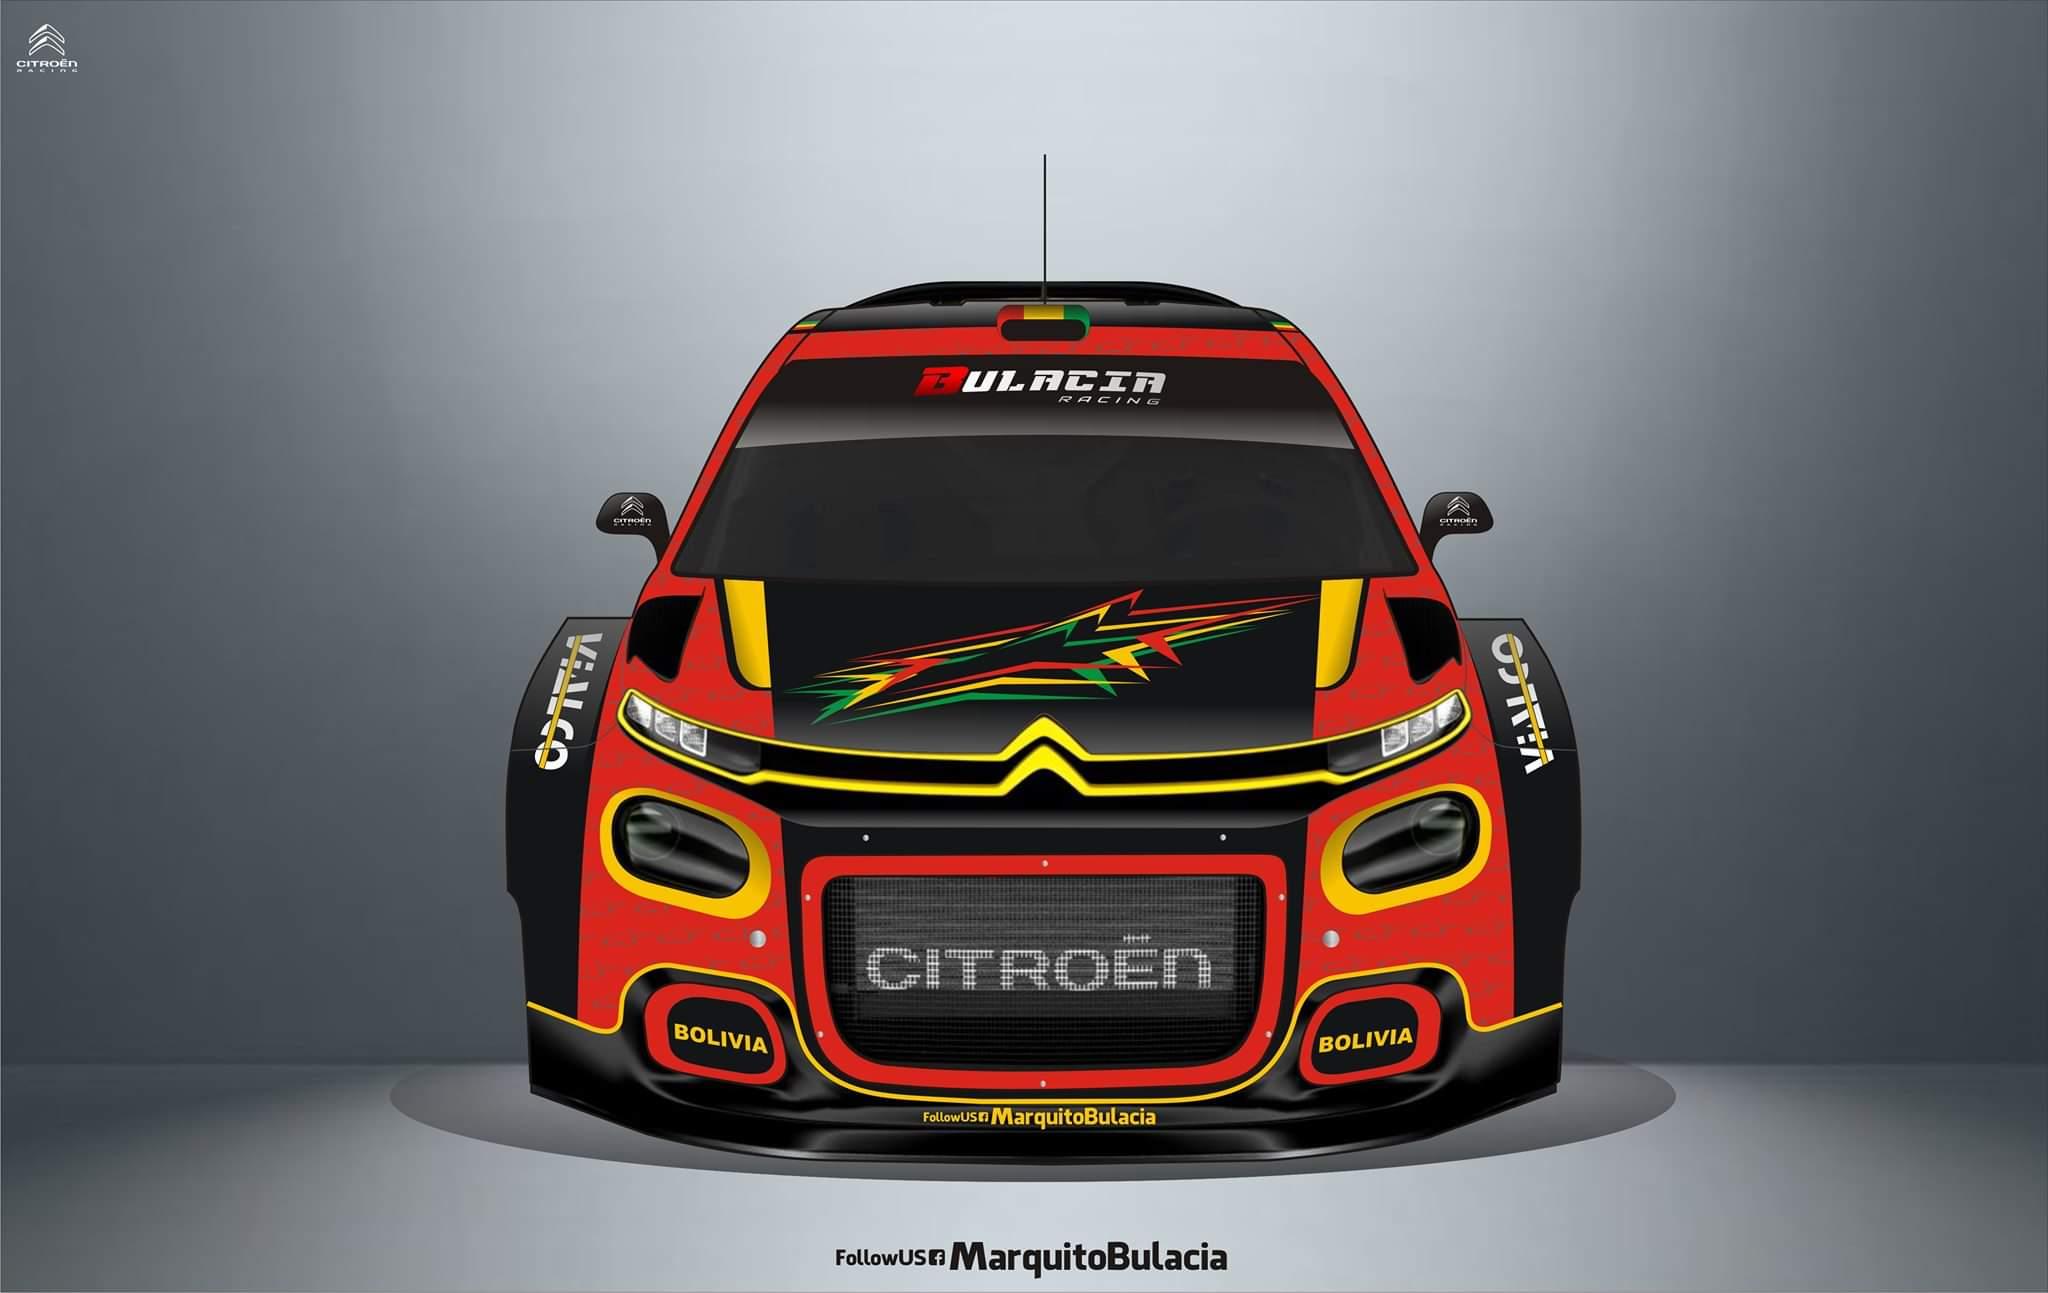 World Rally Championship: Temporada 2020 - Página 6 EOVhOKUX4AICzyD?format=jpg&name=4096x4096